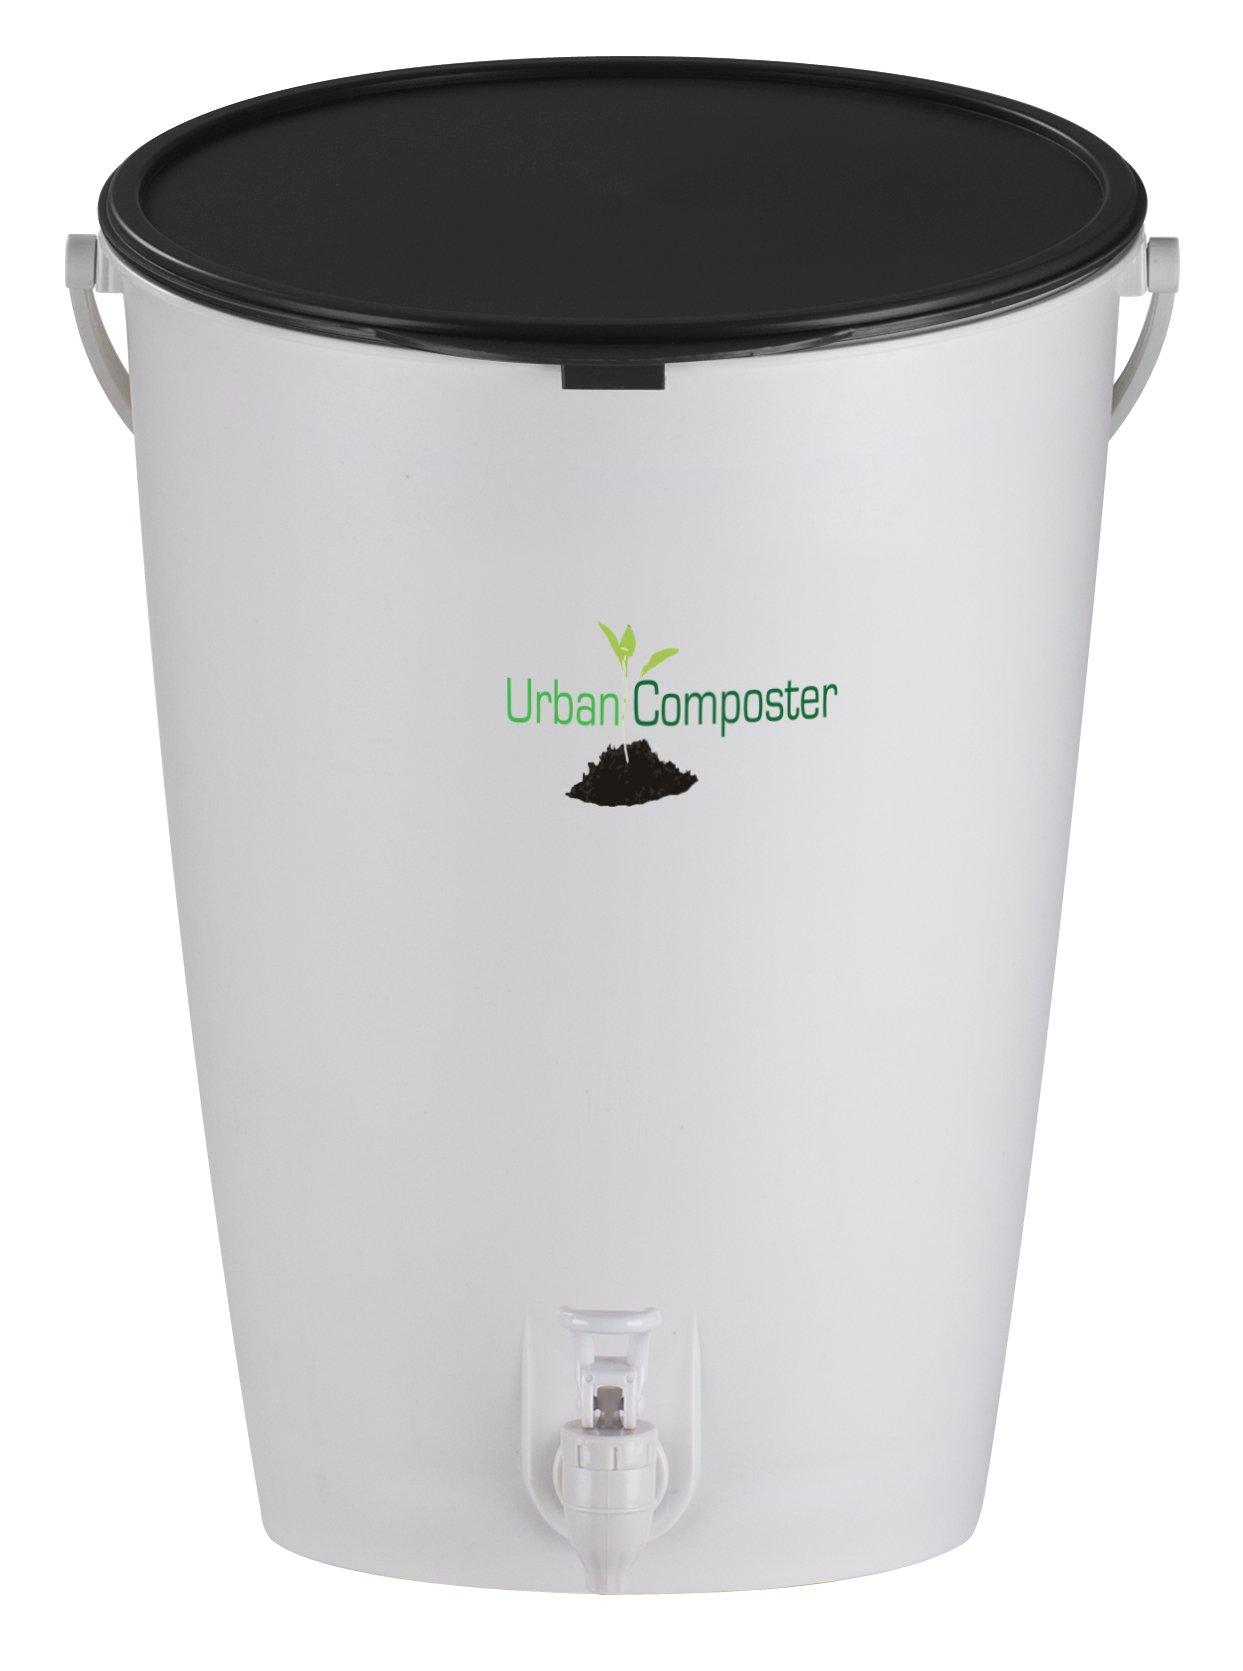 Exaco UClarge-B Urban Composter, 4 Gal, Black